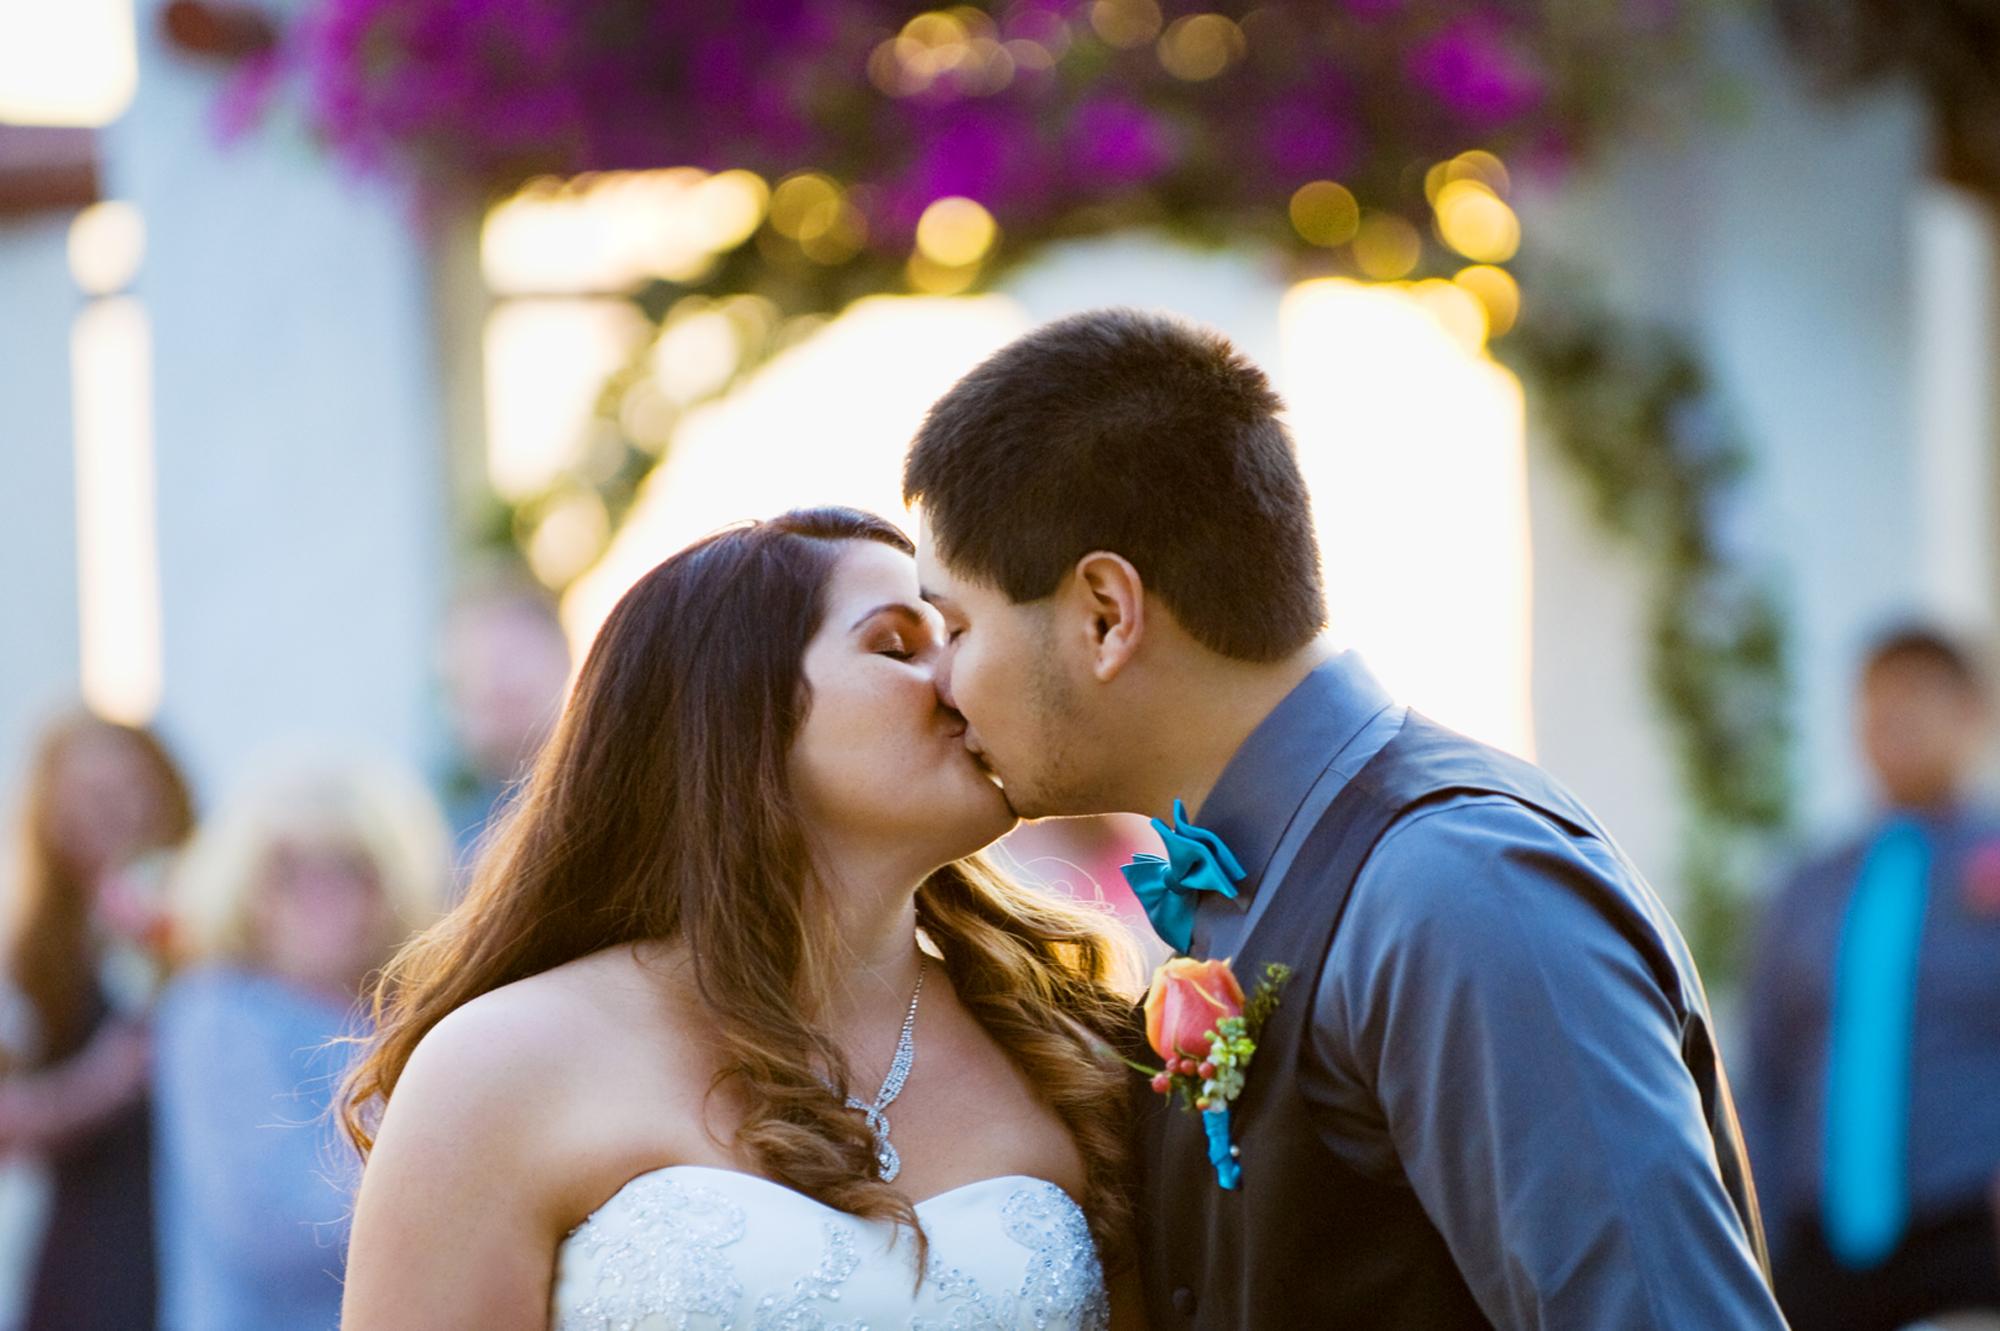 20151205_DanaPoint_PalisadesGazebo_Wedding_BrandonMelissa_430web